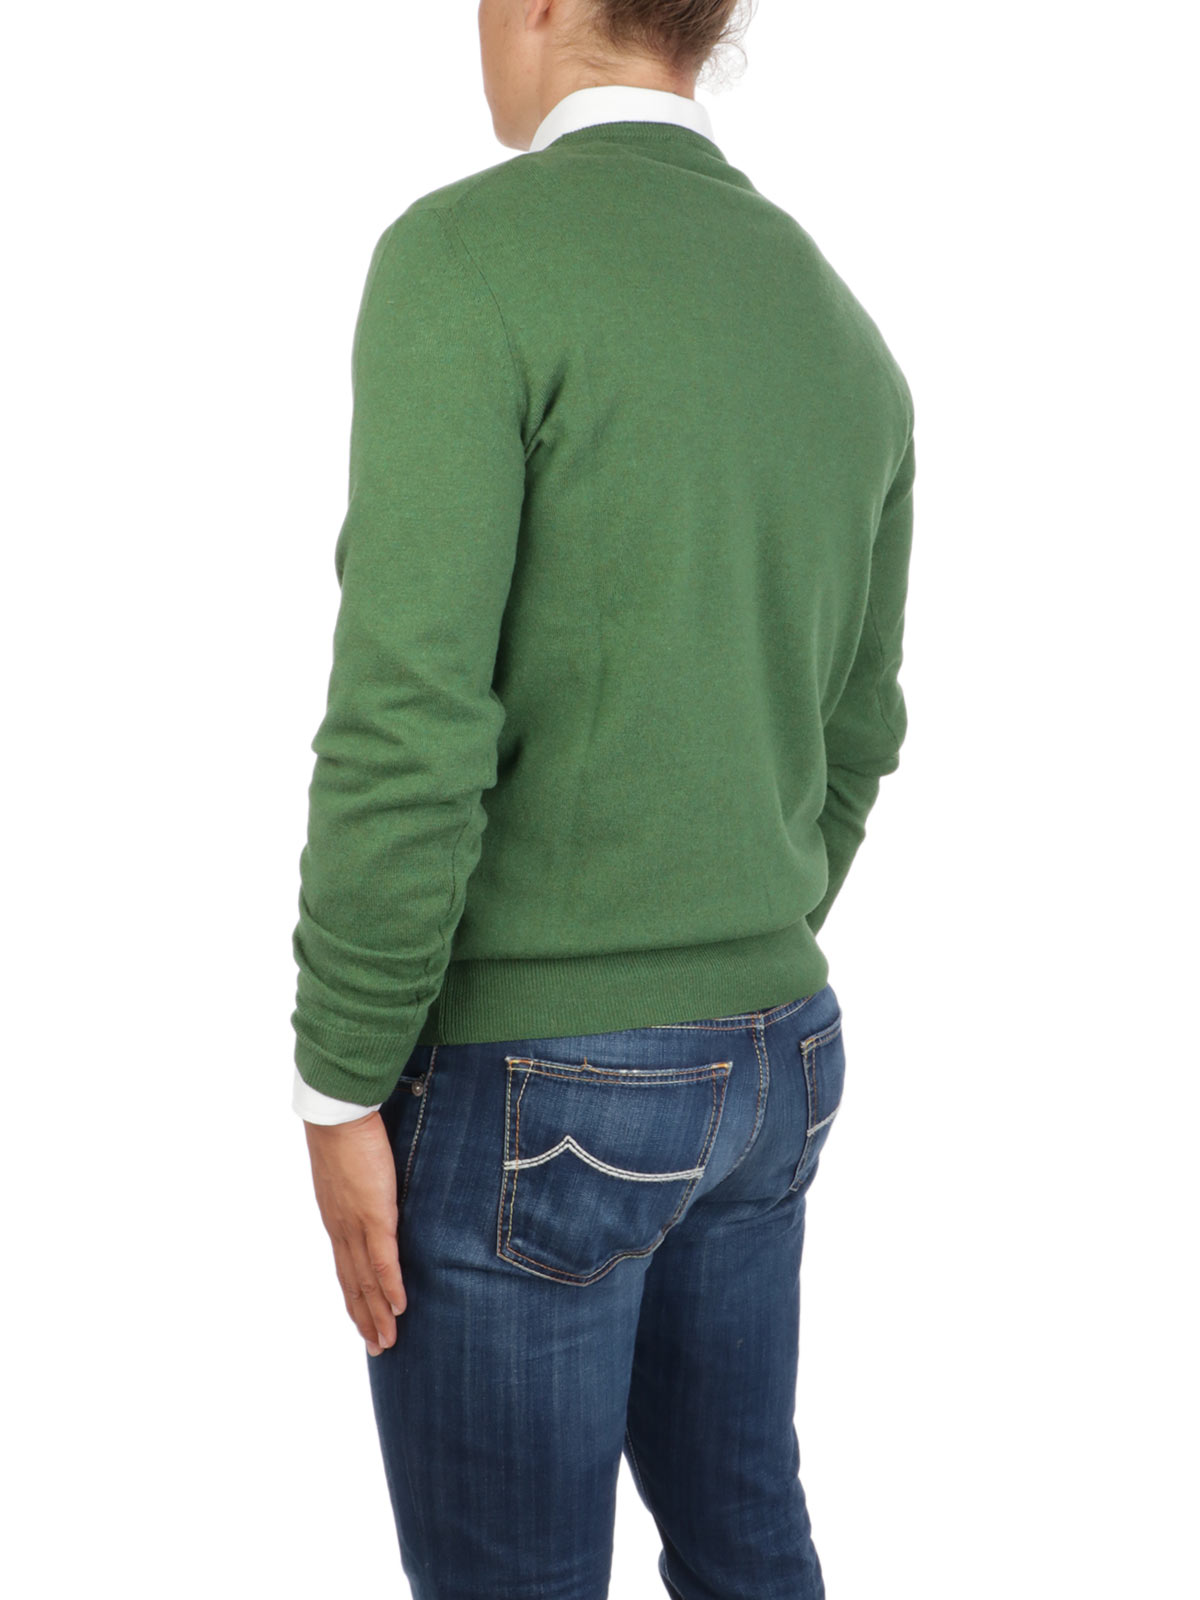 Immagine di BROOKSFIELD | Pullover Uomo in Lana Supergeelong